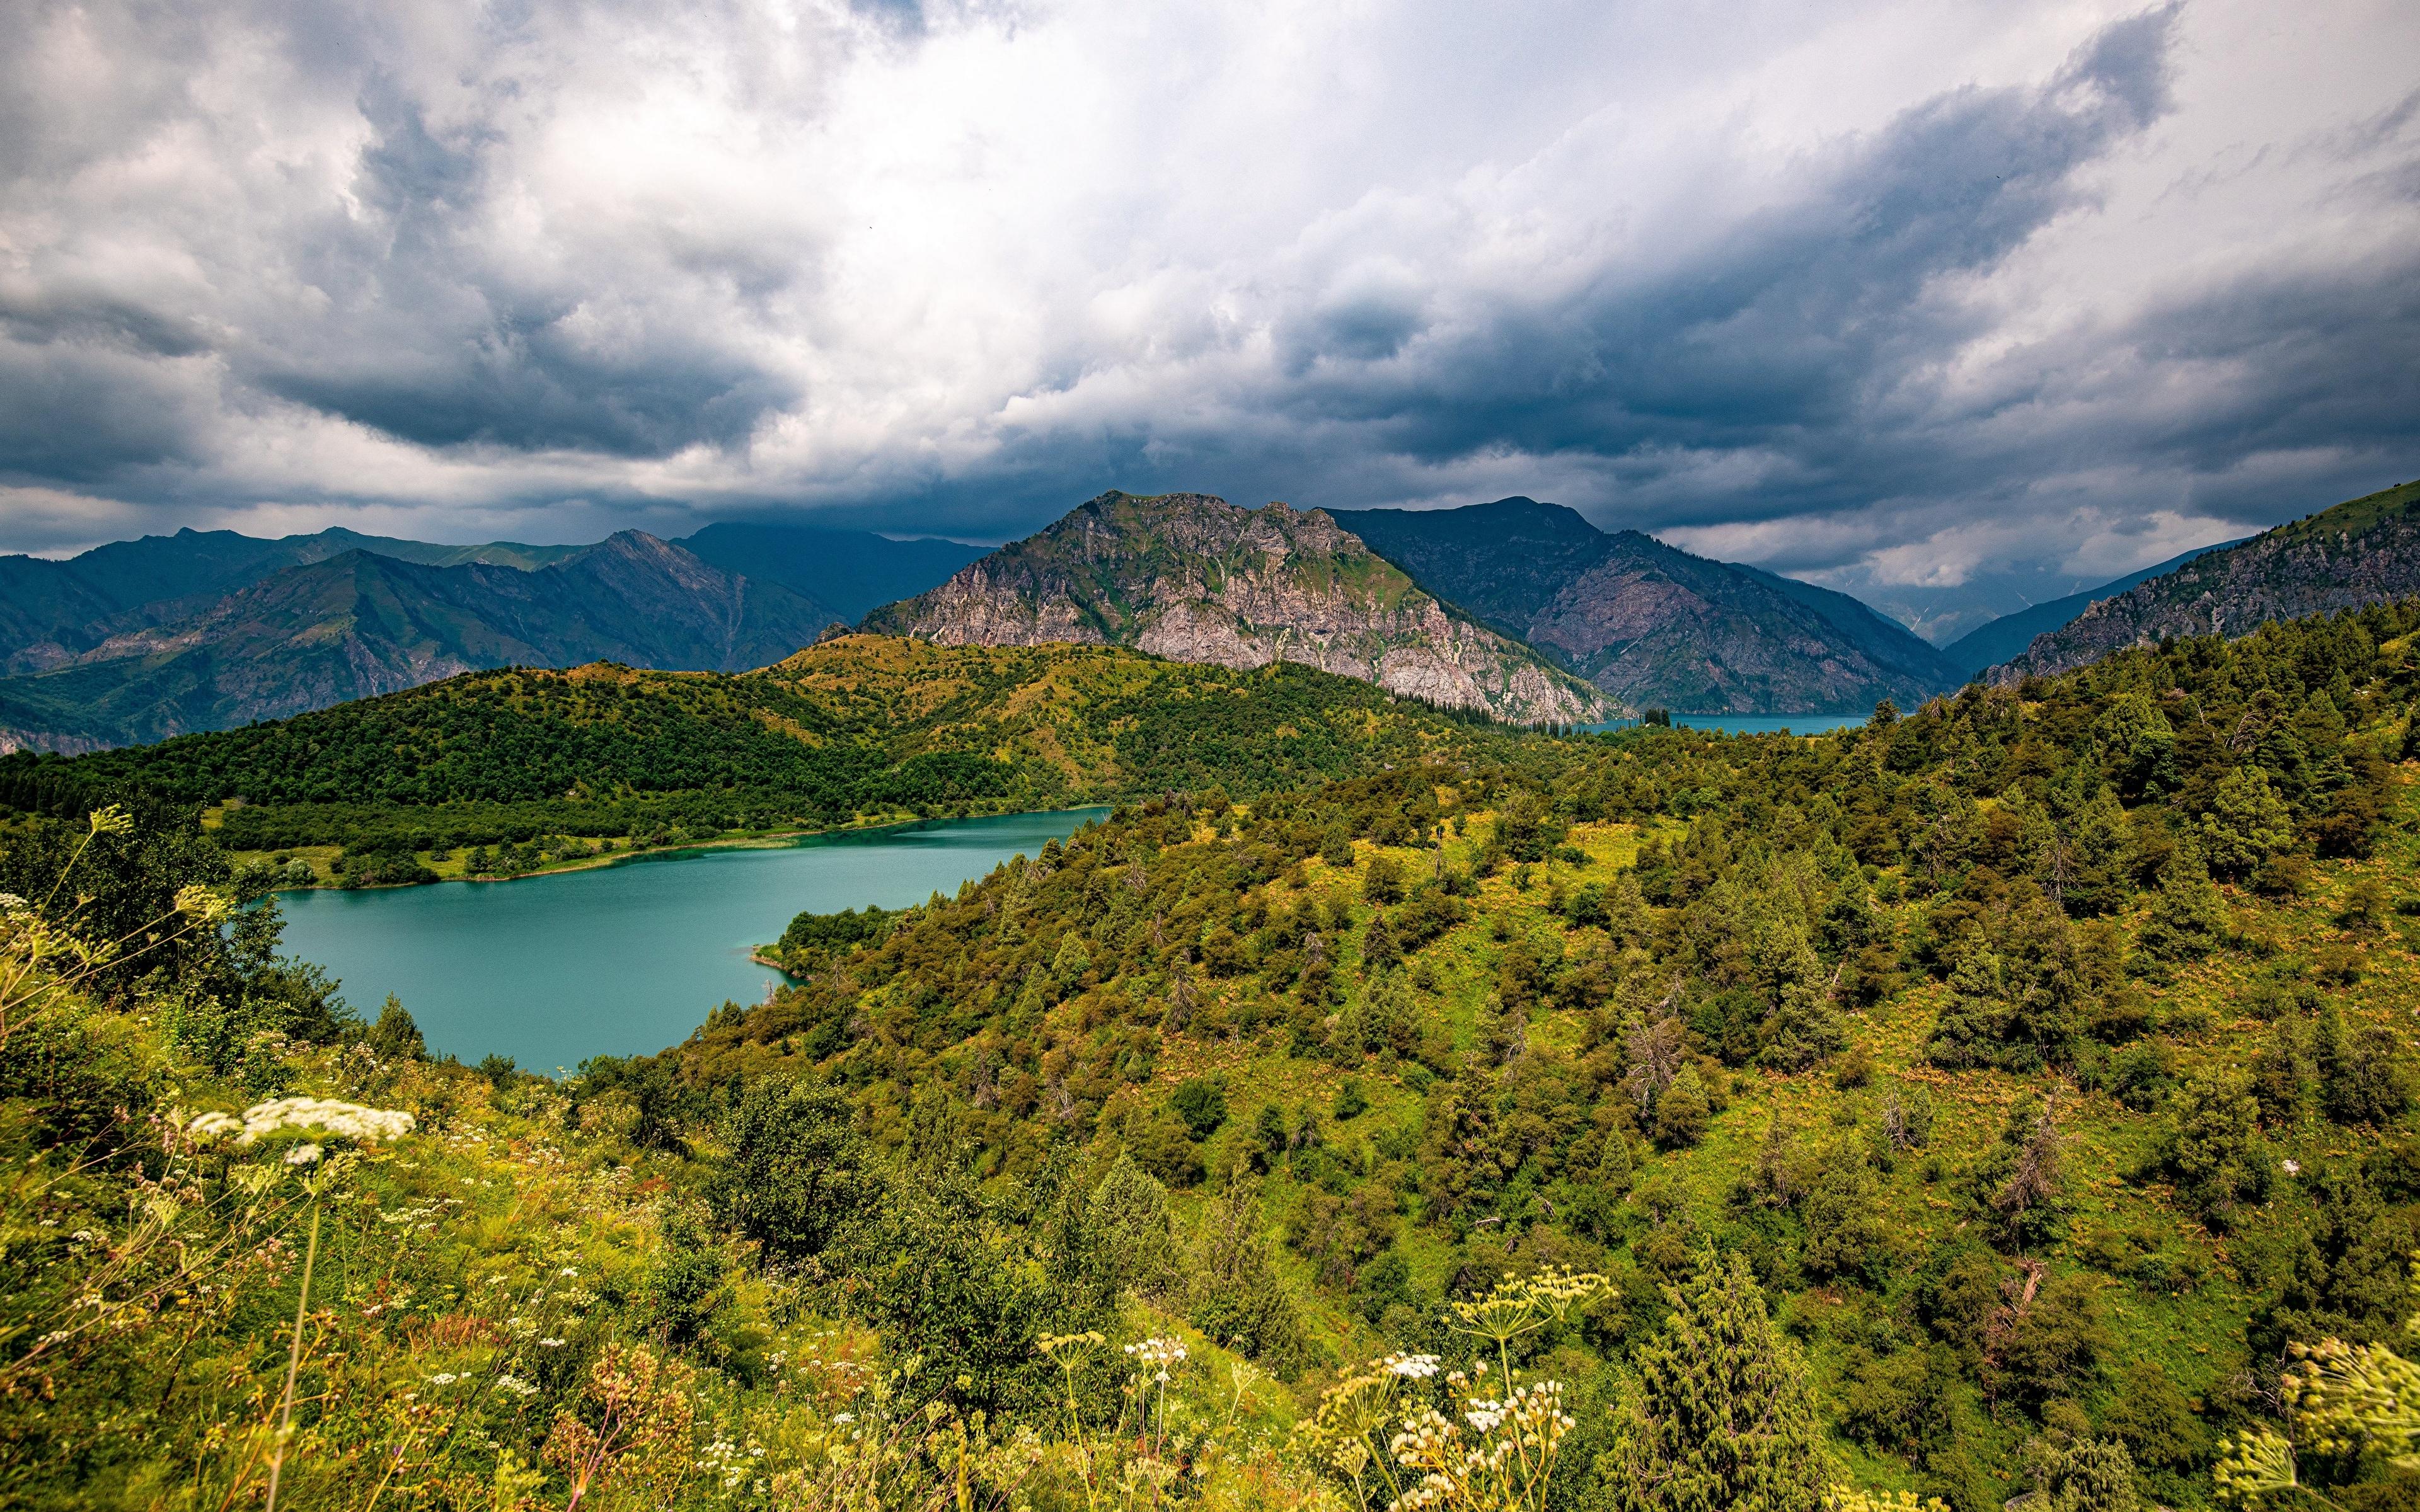 Картинки Sary-Chelek Lake, Kyrgyzstan гора Природа Озеро облачно 3840x2400 Горы Облака облако